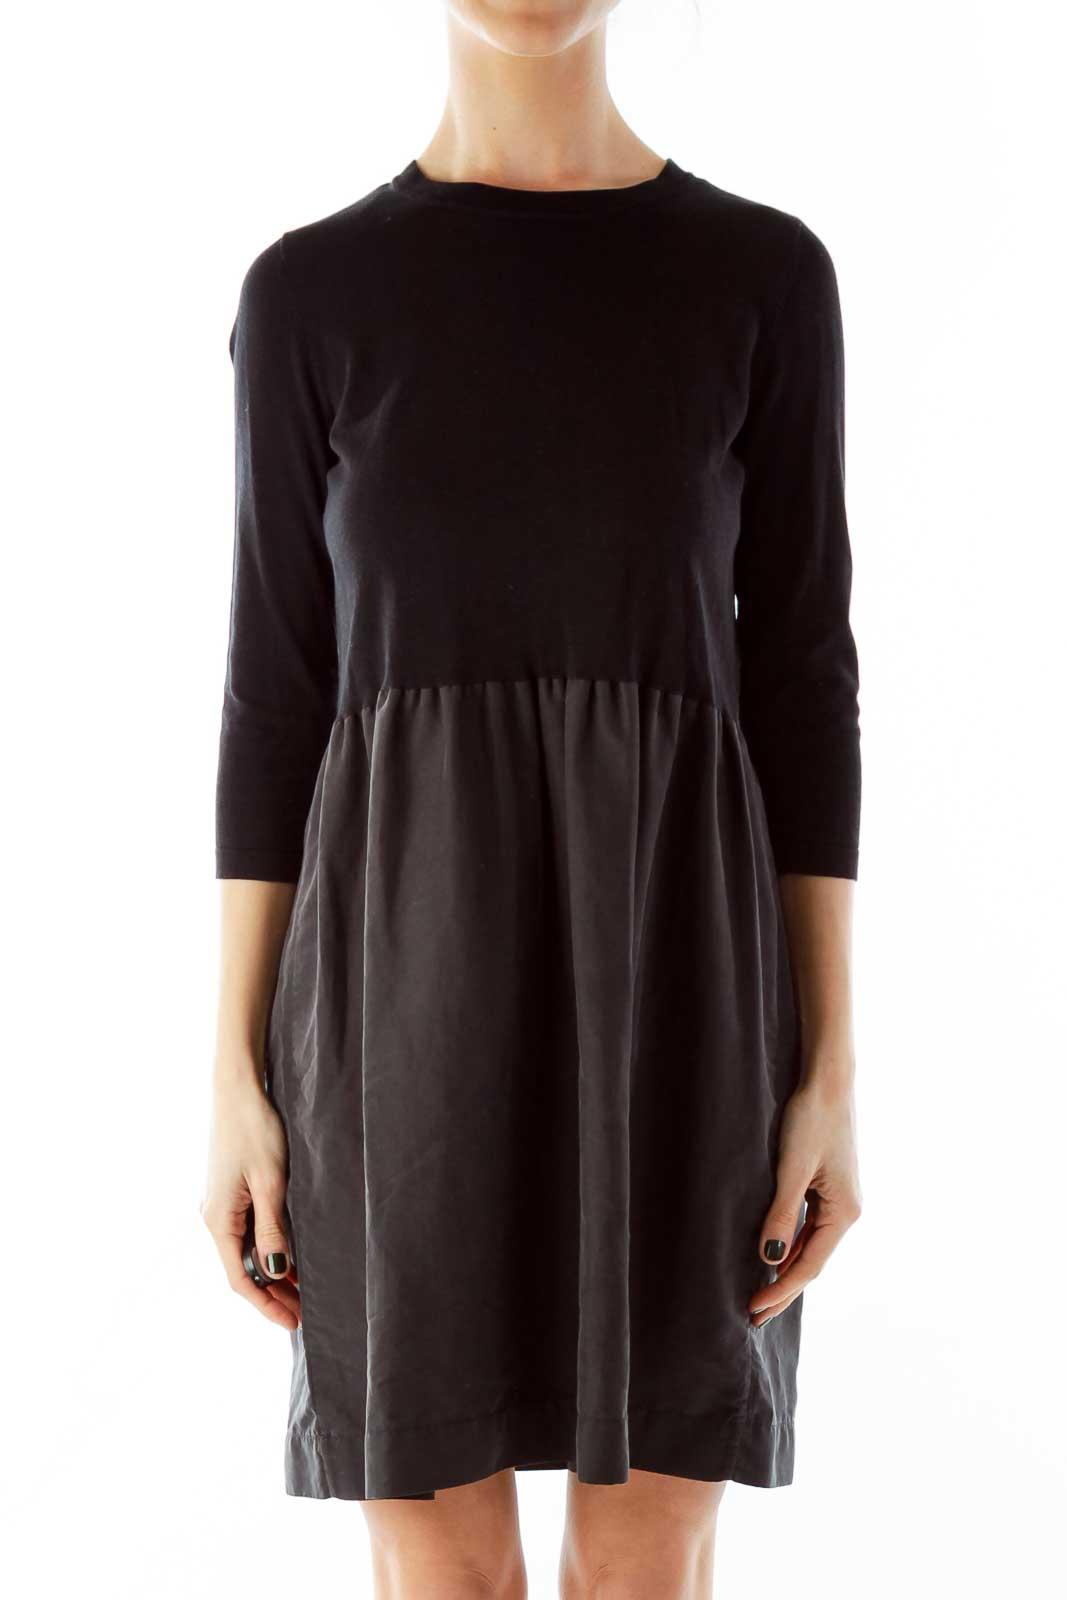 Black Knit A-Line Day Dress Front